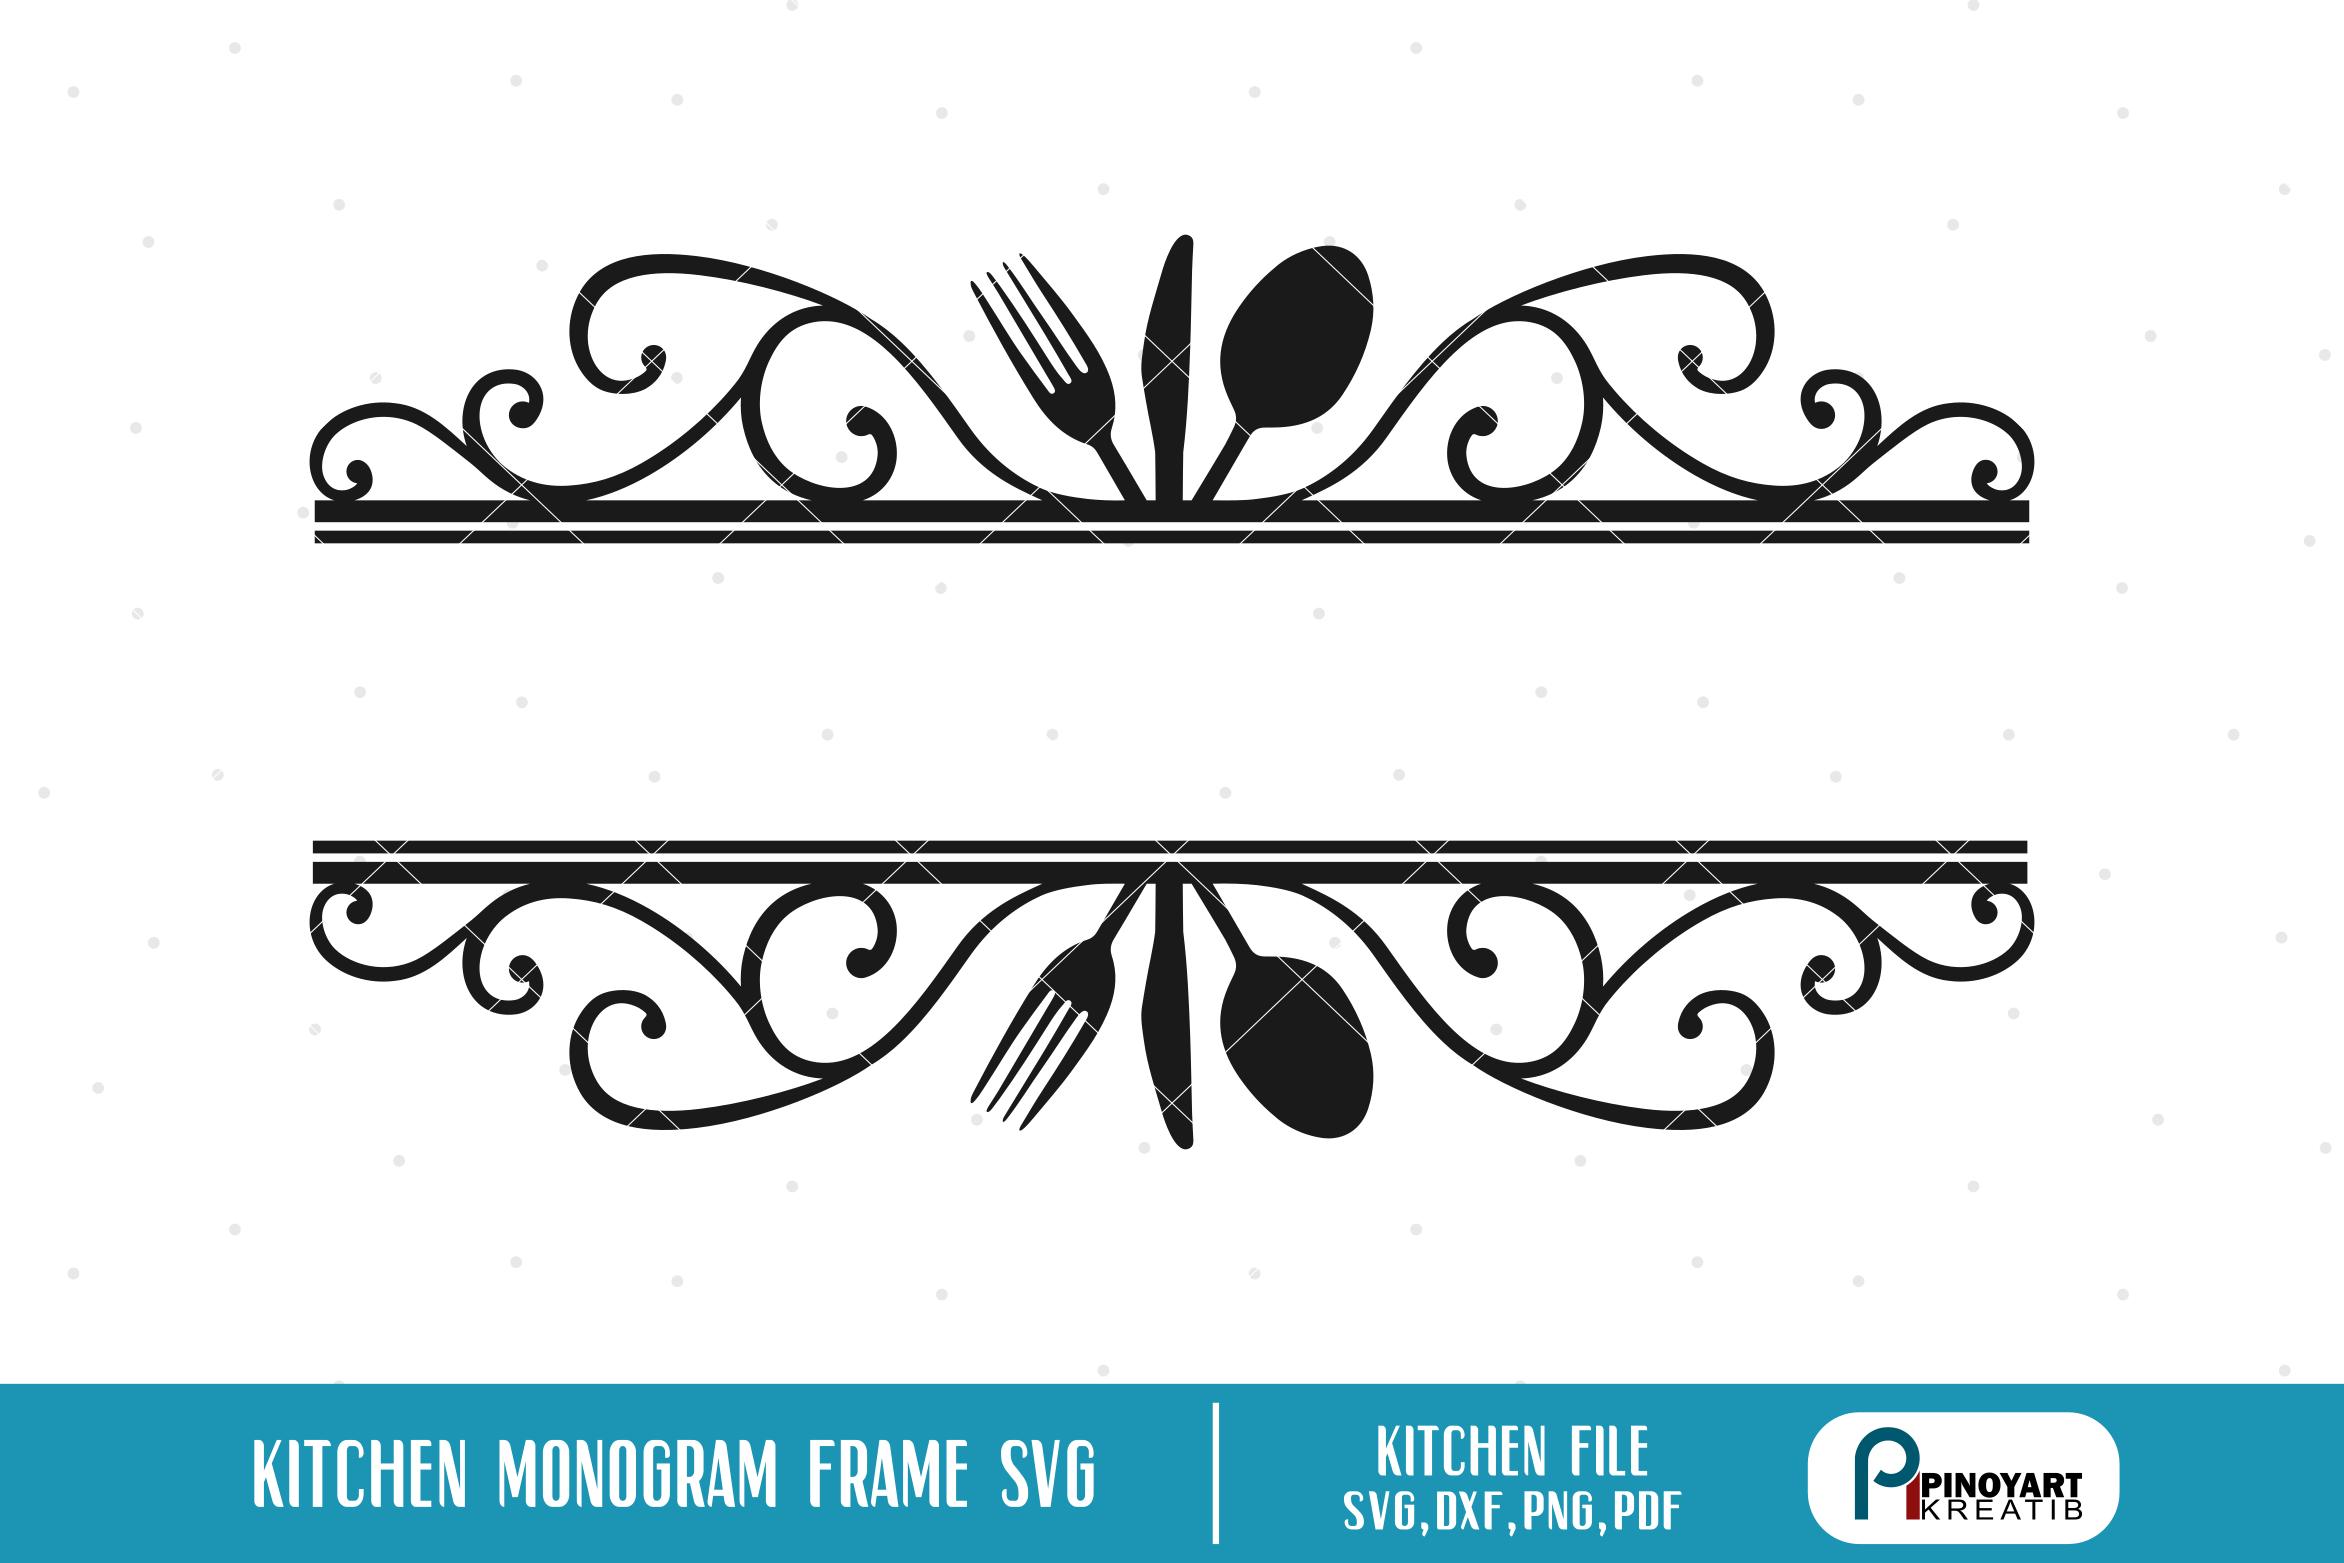 Kitchen Split Monogram Frame svg - a kitchen monogram ...